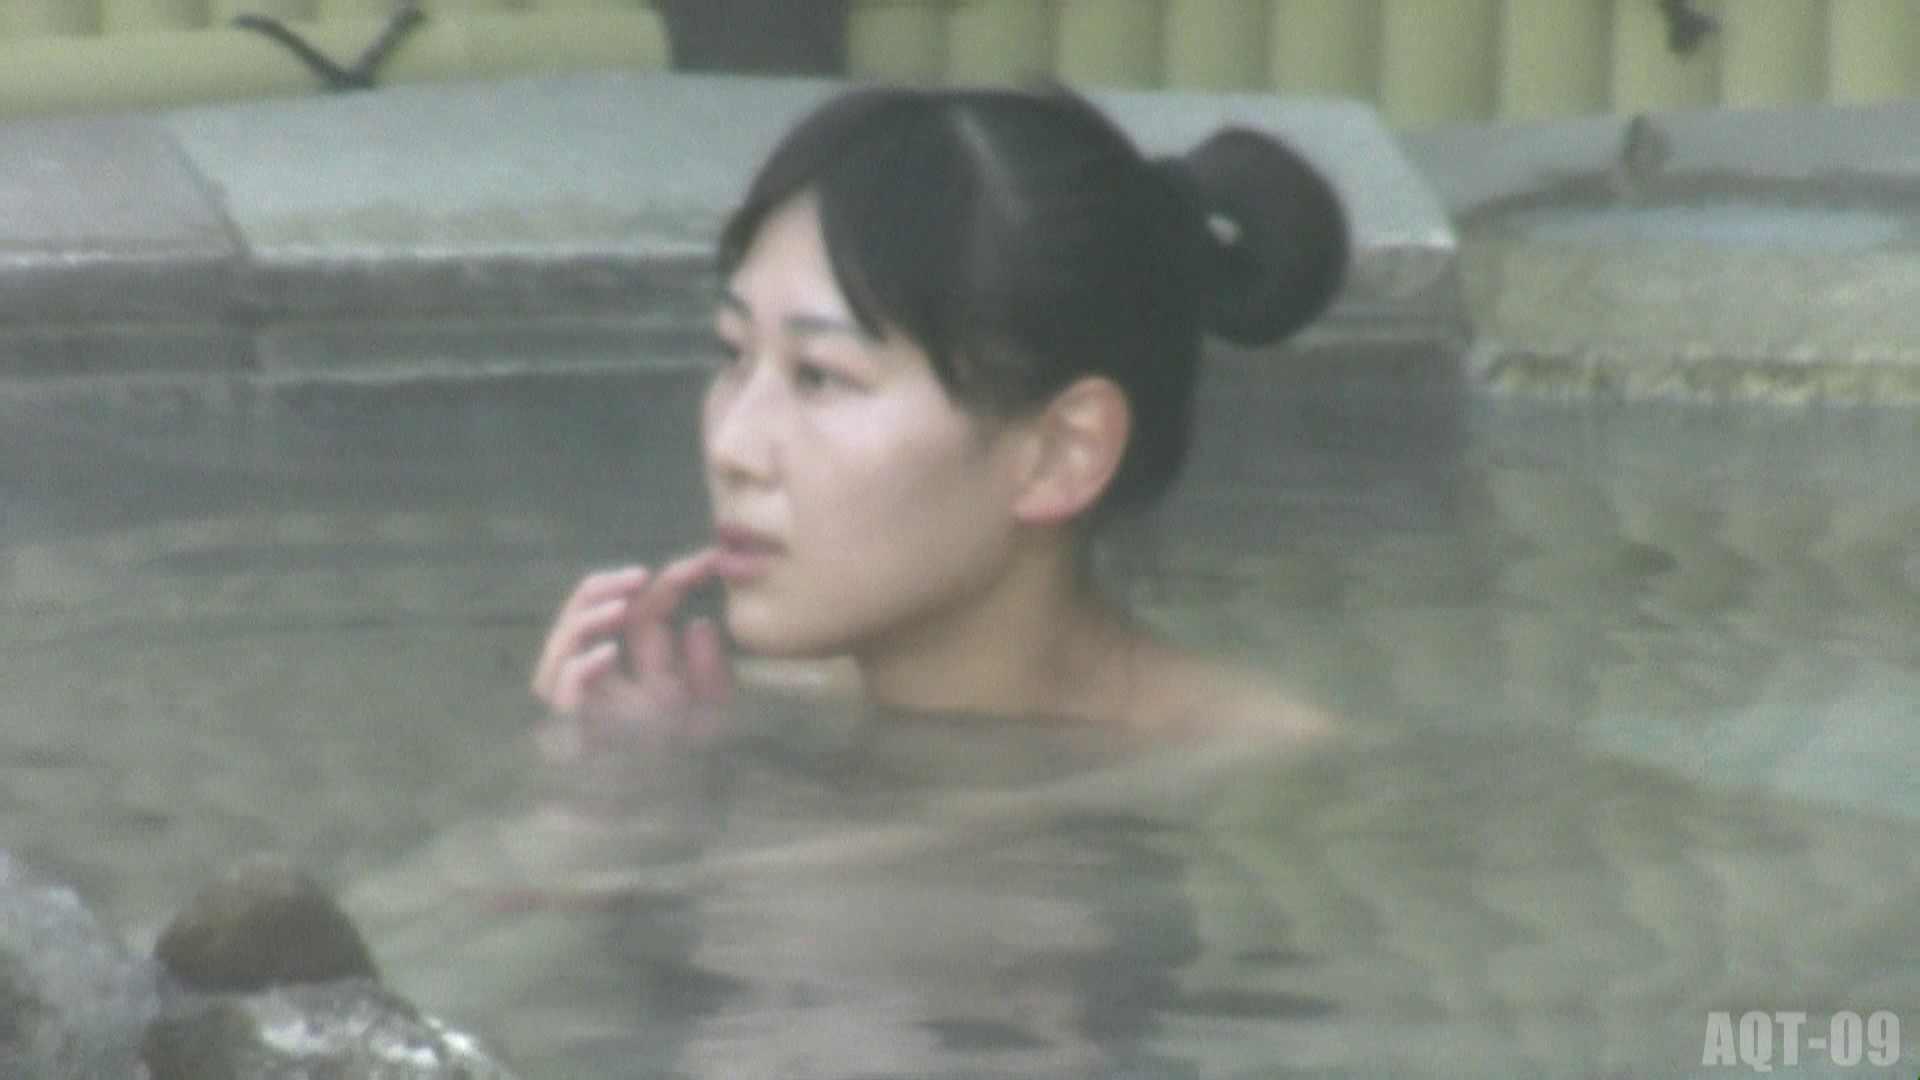 Aquaな露天風呂Vol.785 美しいOLの裸体   露天風呂突入  84pic 22